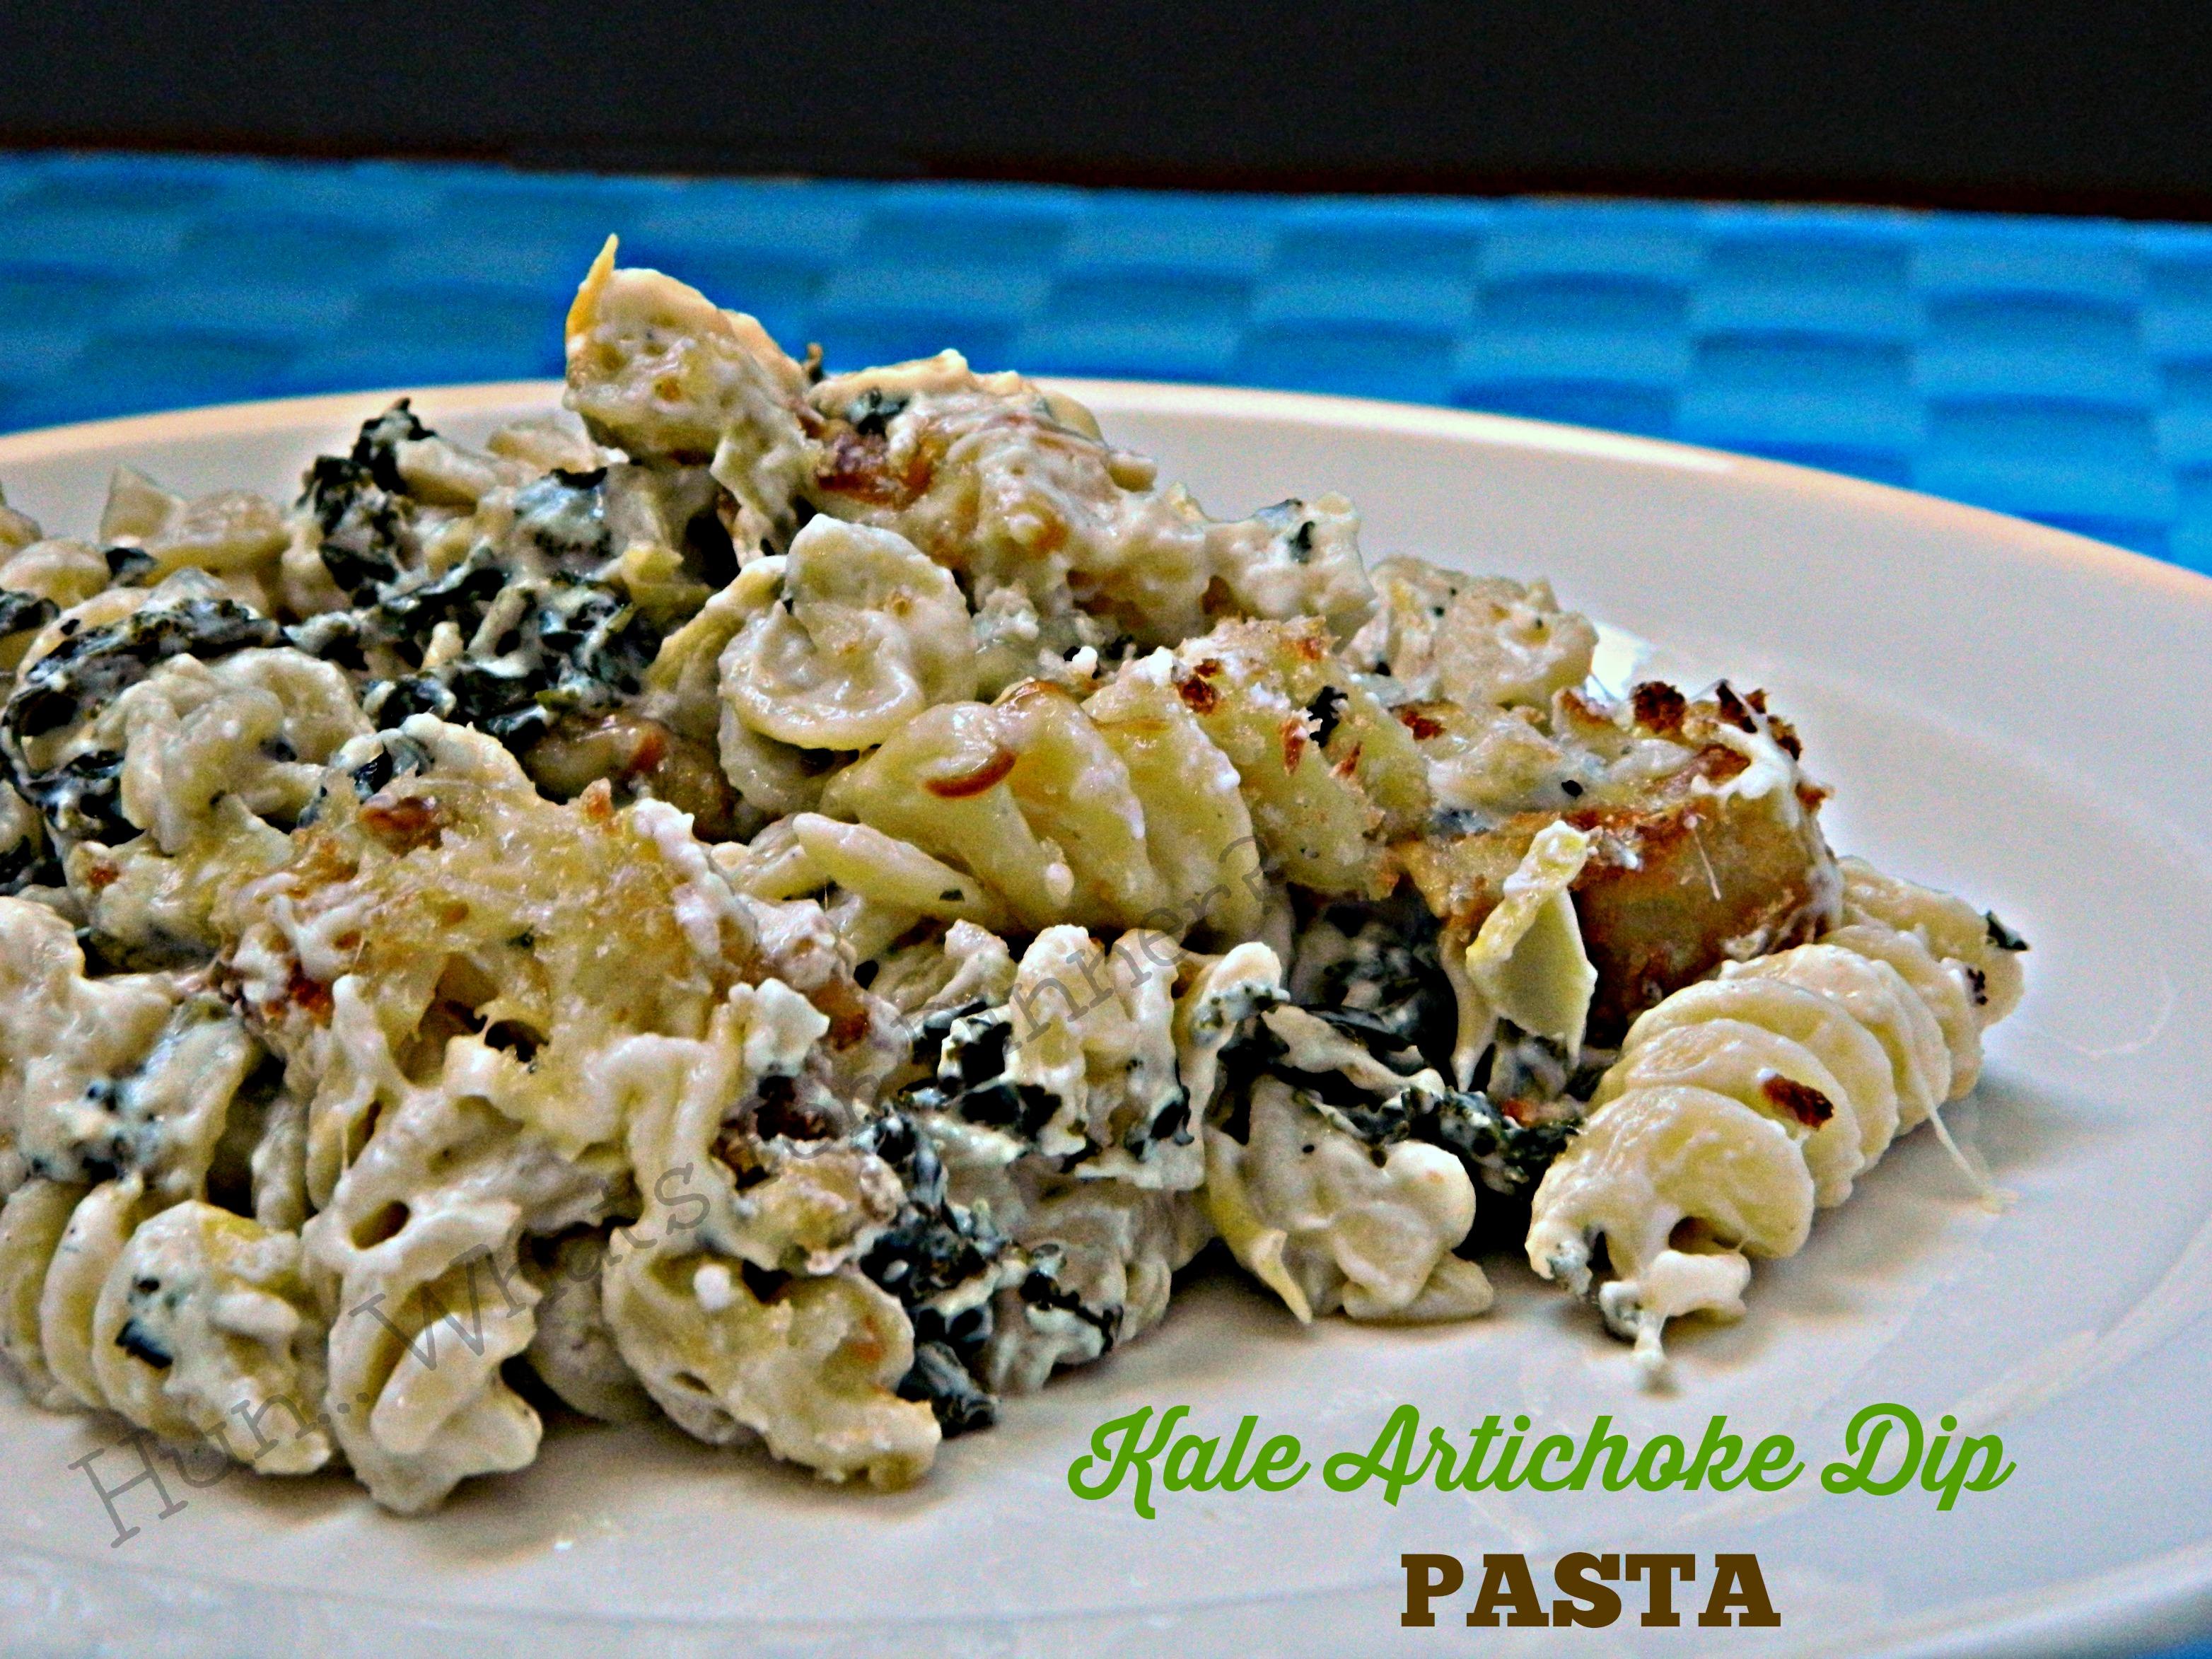 Kale Artichoke Dip Pasta- Guest Post